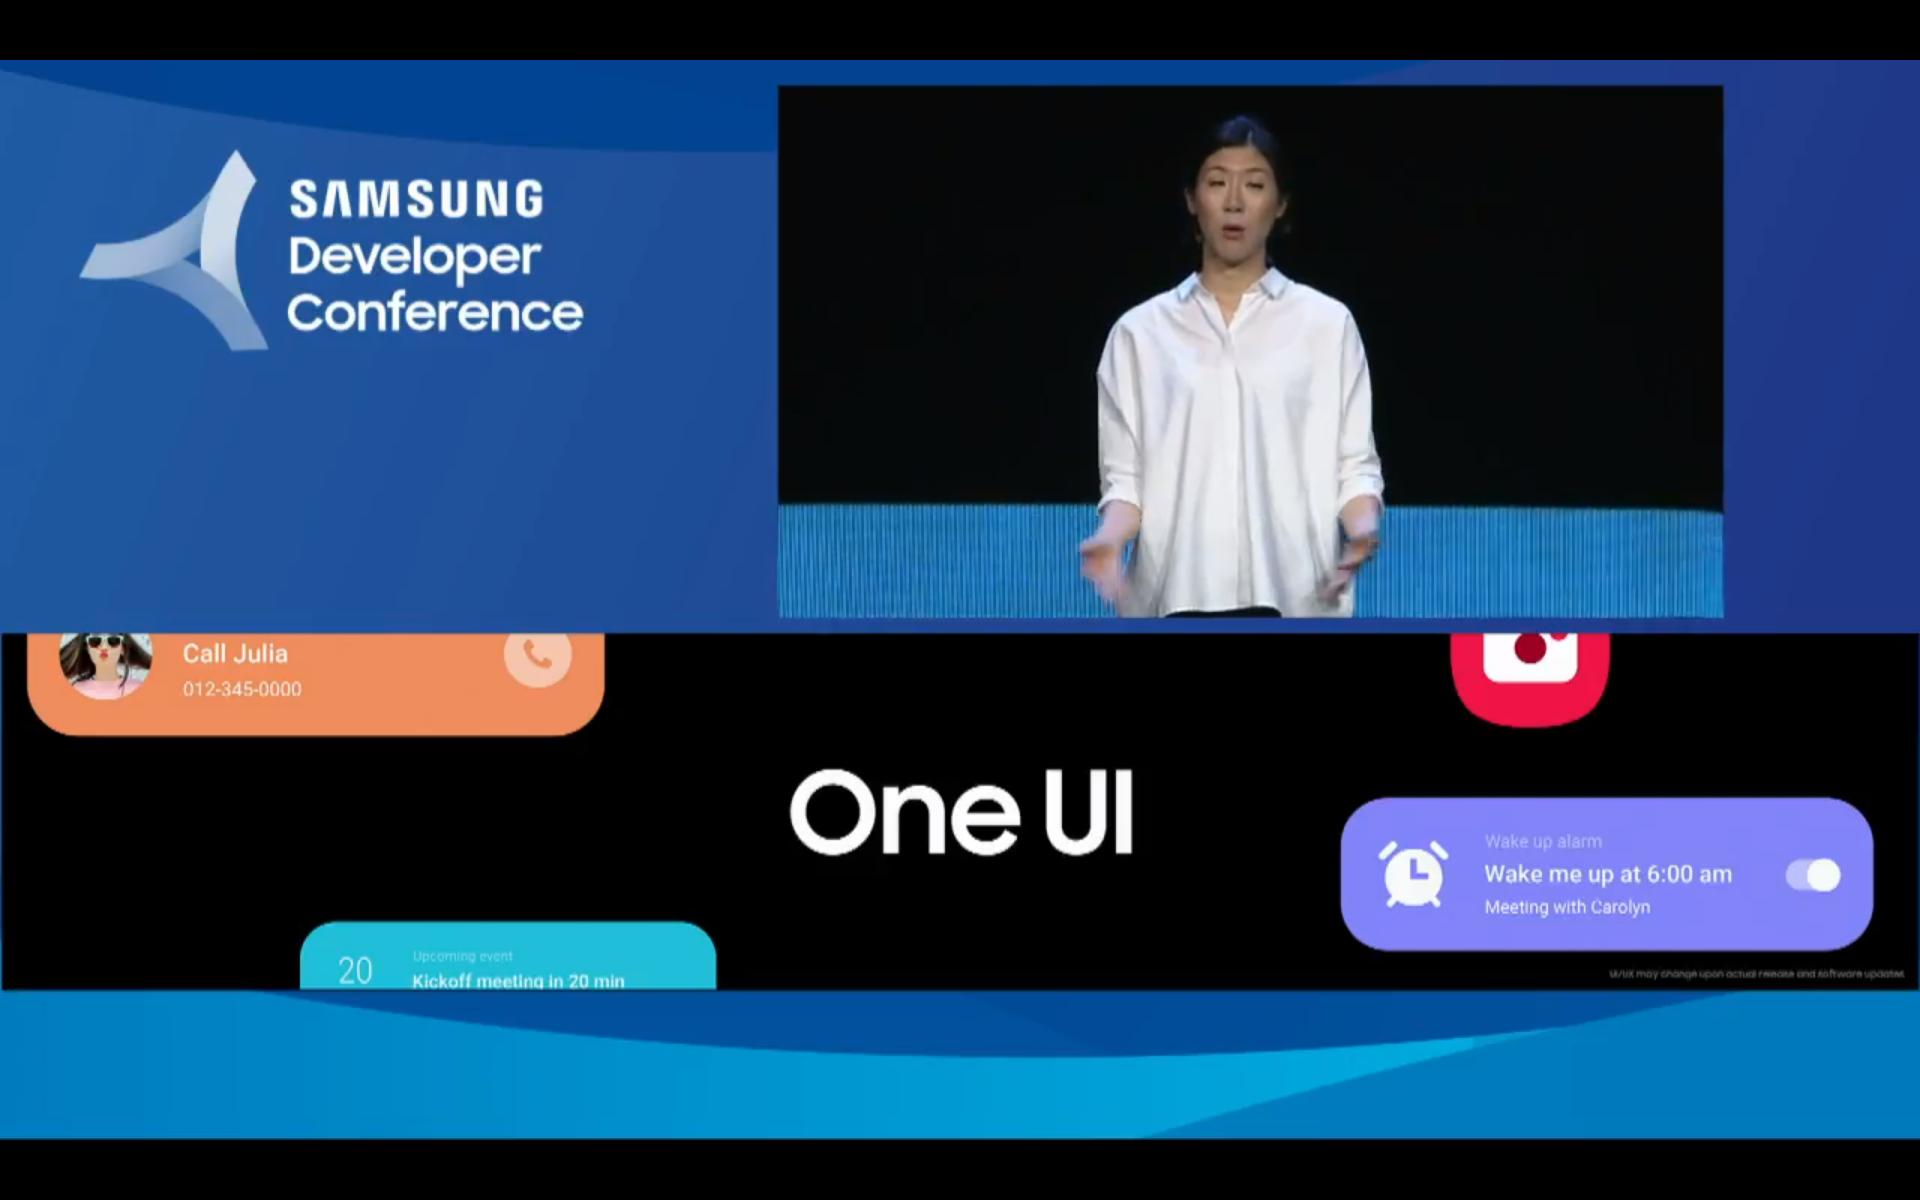 Samsung camera apk sammobile | Samsung Galaxy Note 10 may get 5G